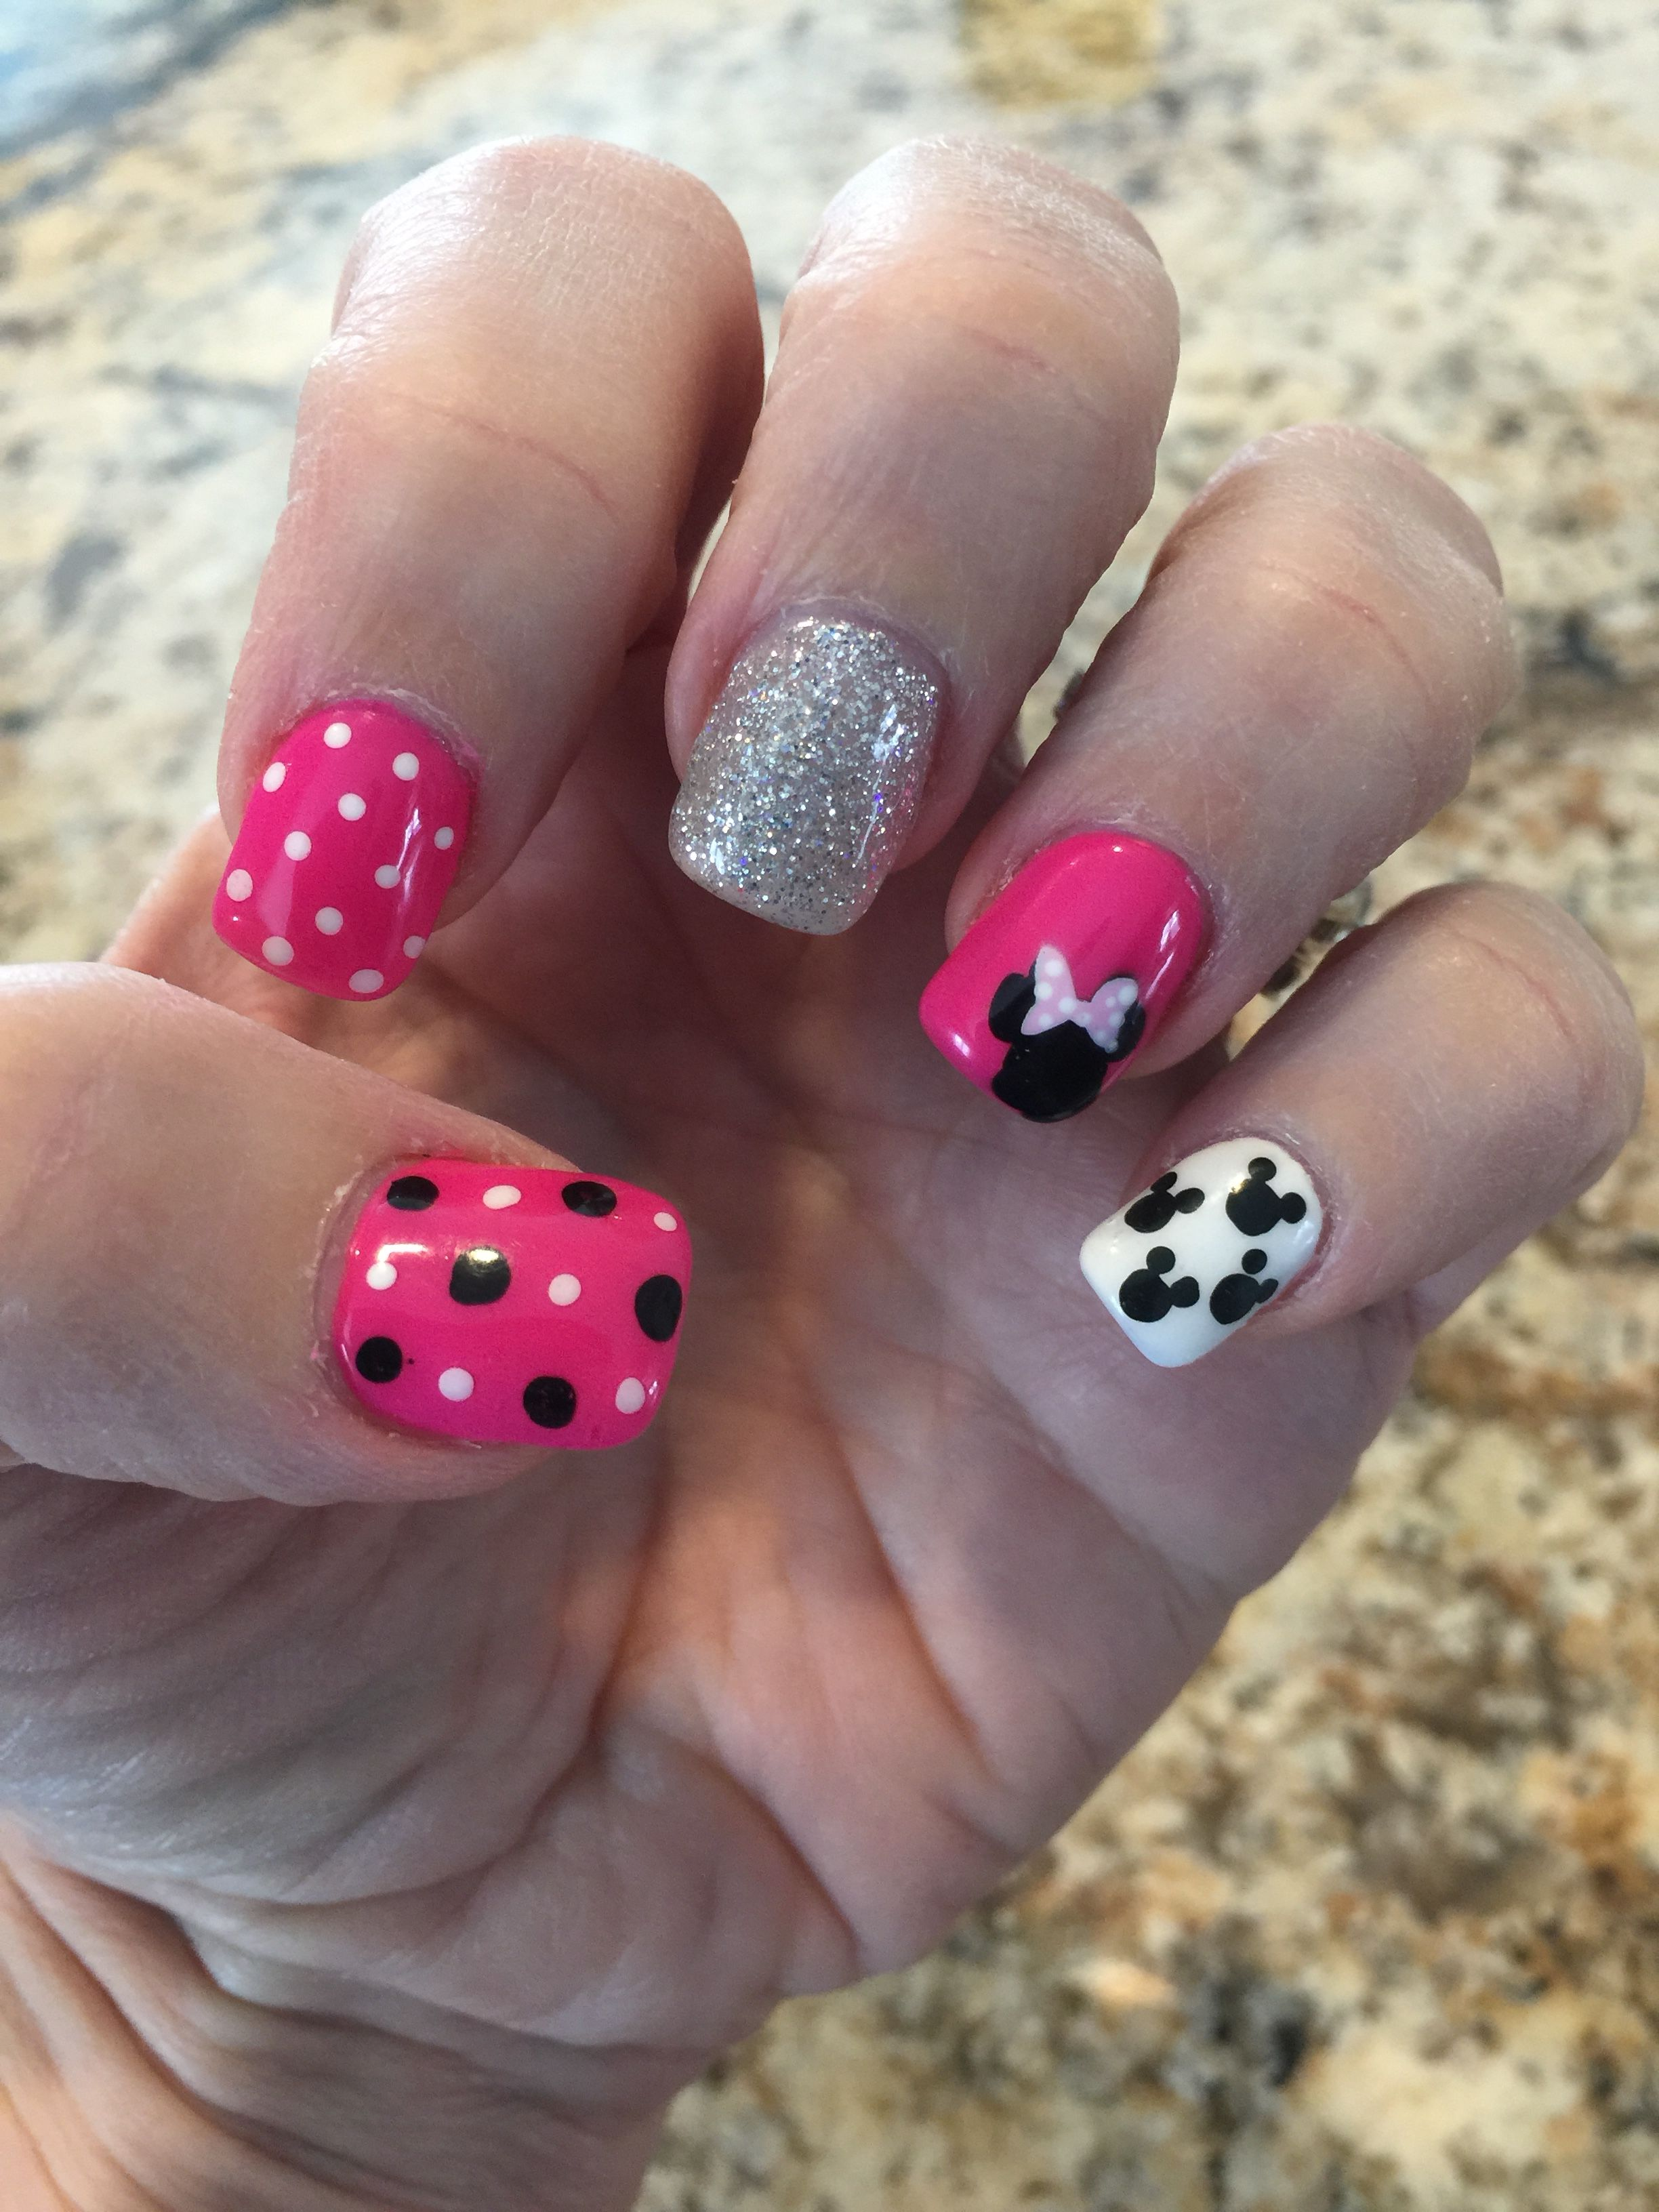 My March Disney nail design | Nails | Pinterest | Disney nail ...